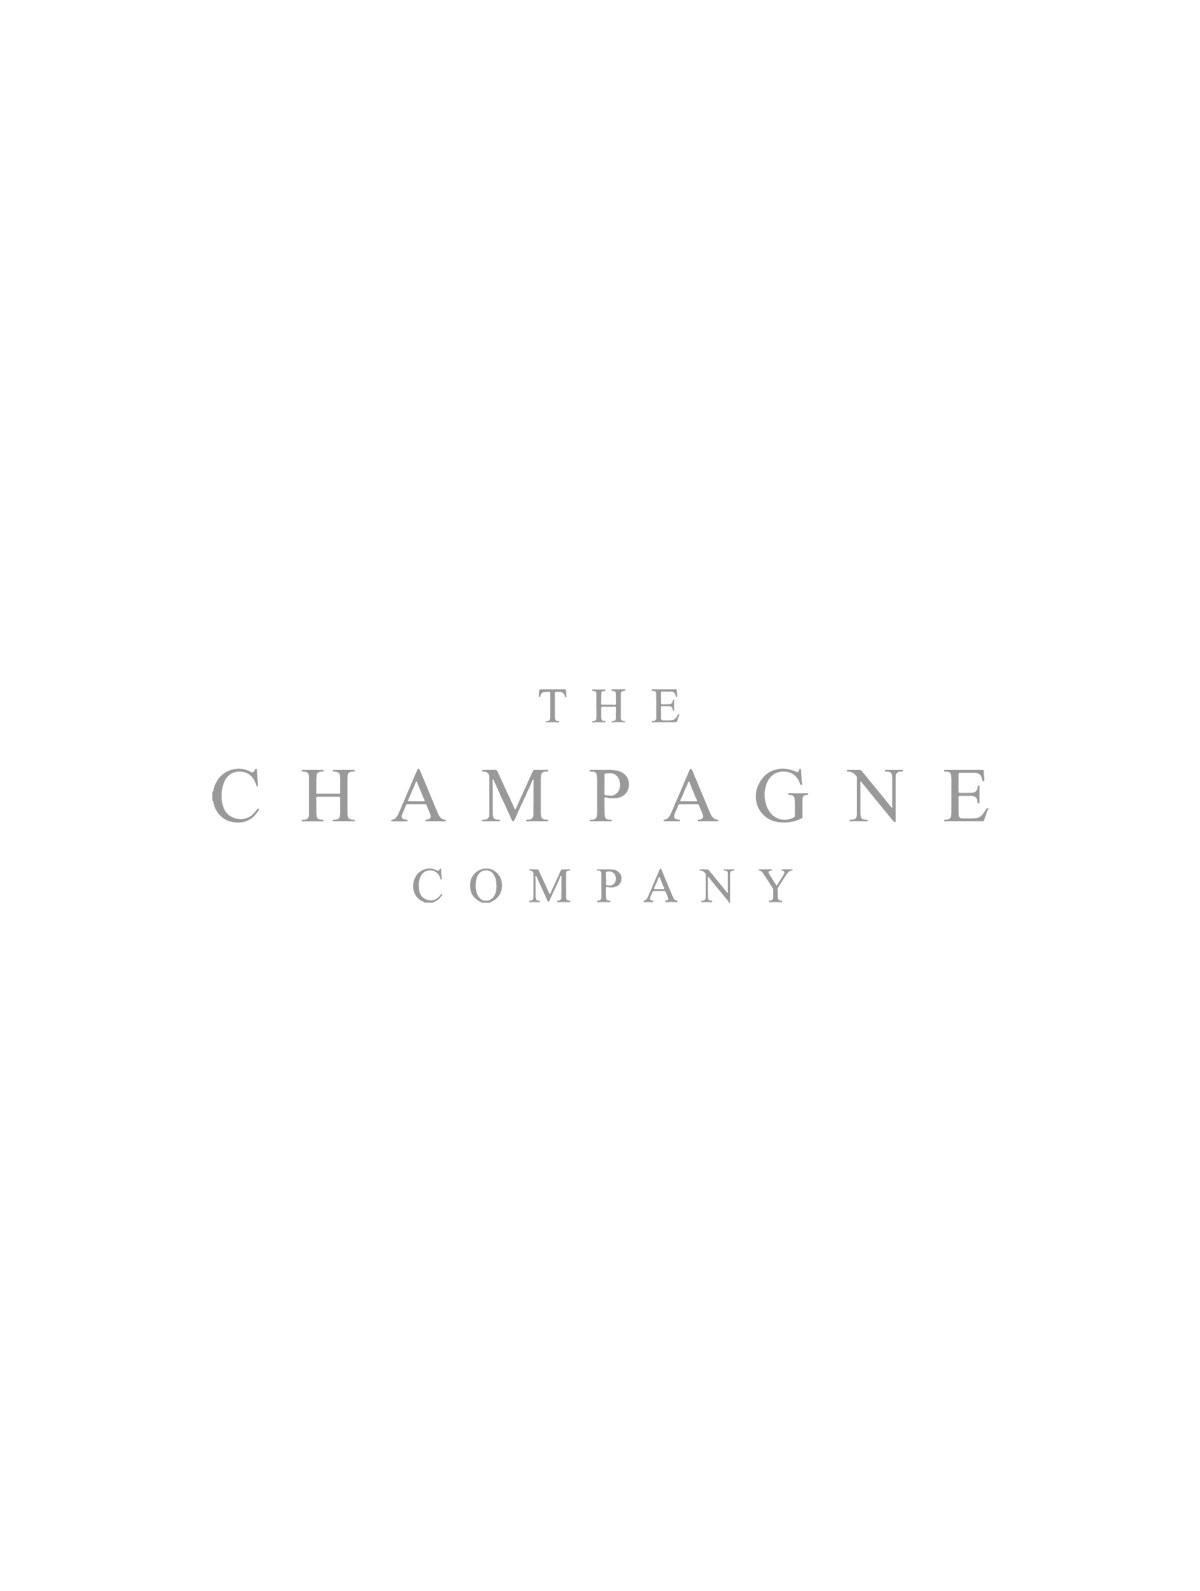 Glenmorangie Malt Whisky Pioneer Gift Set 70cl 2x 5cl